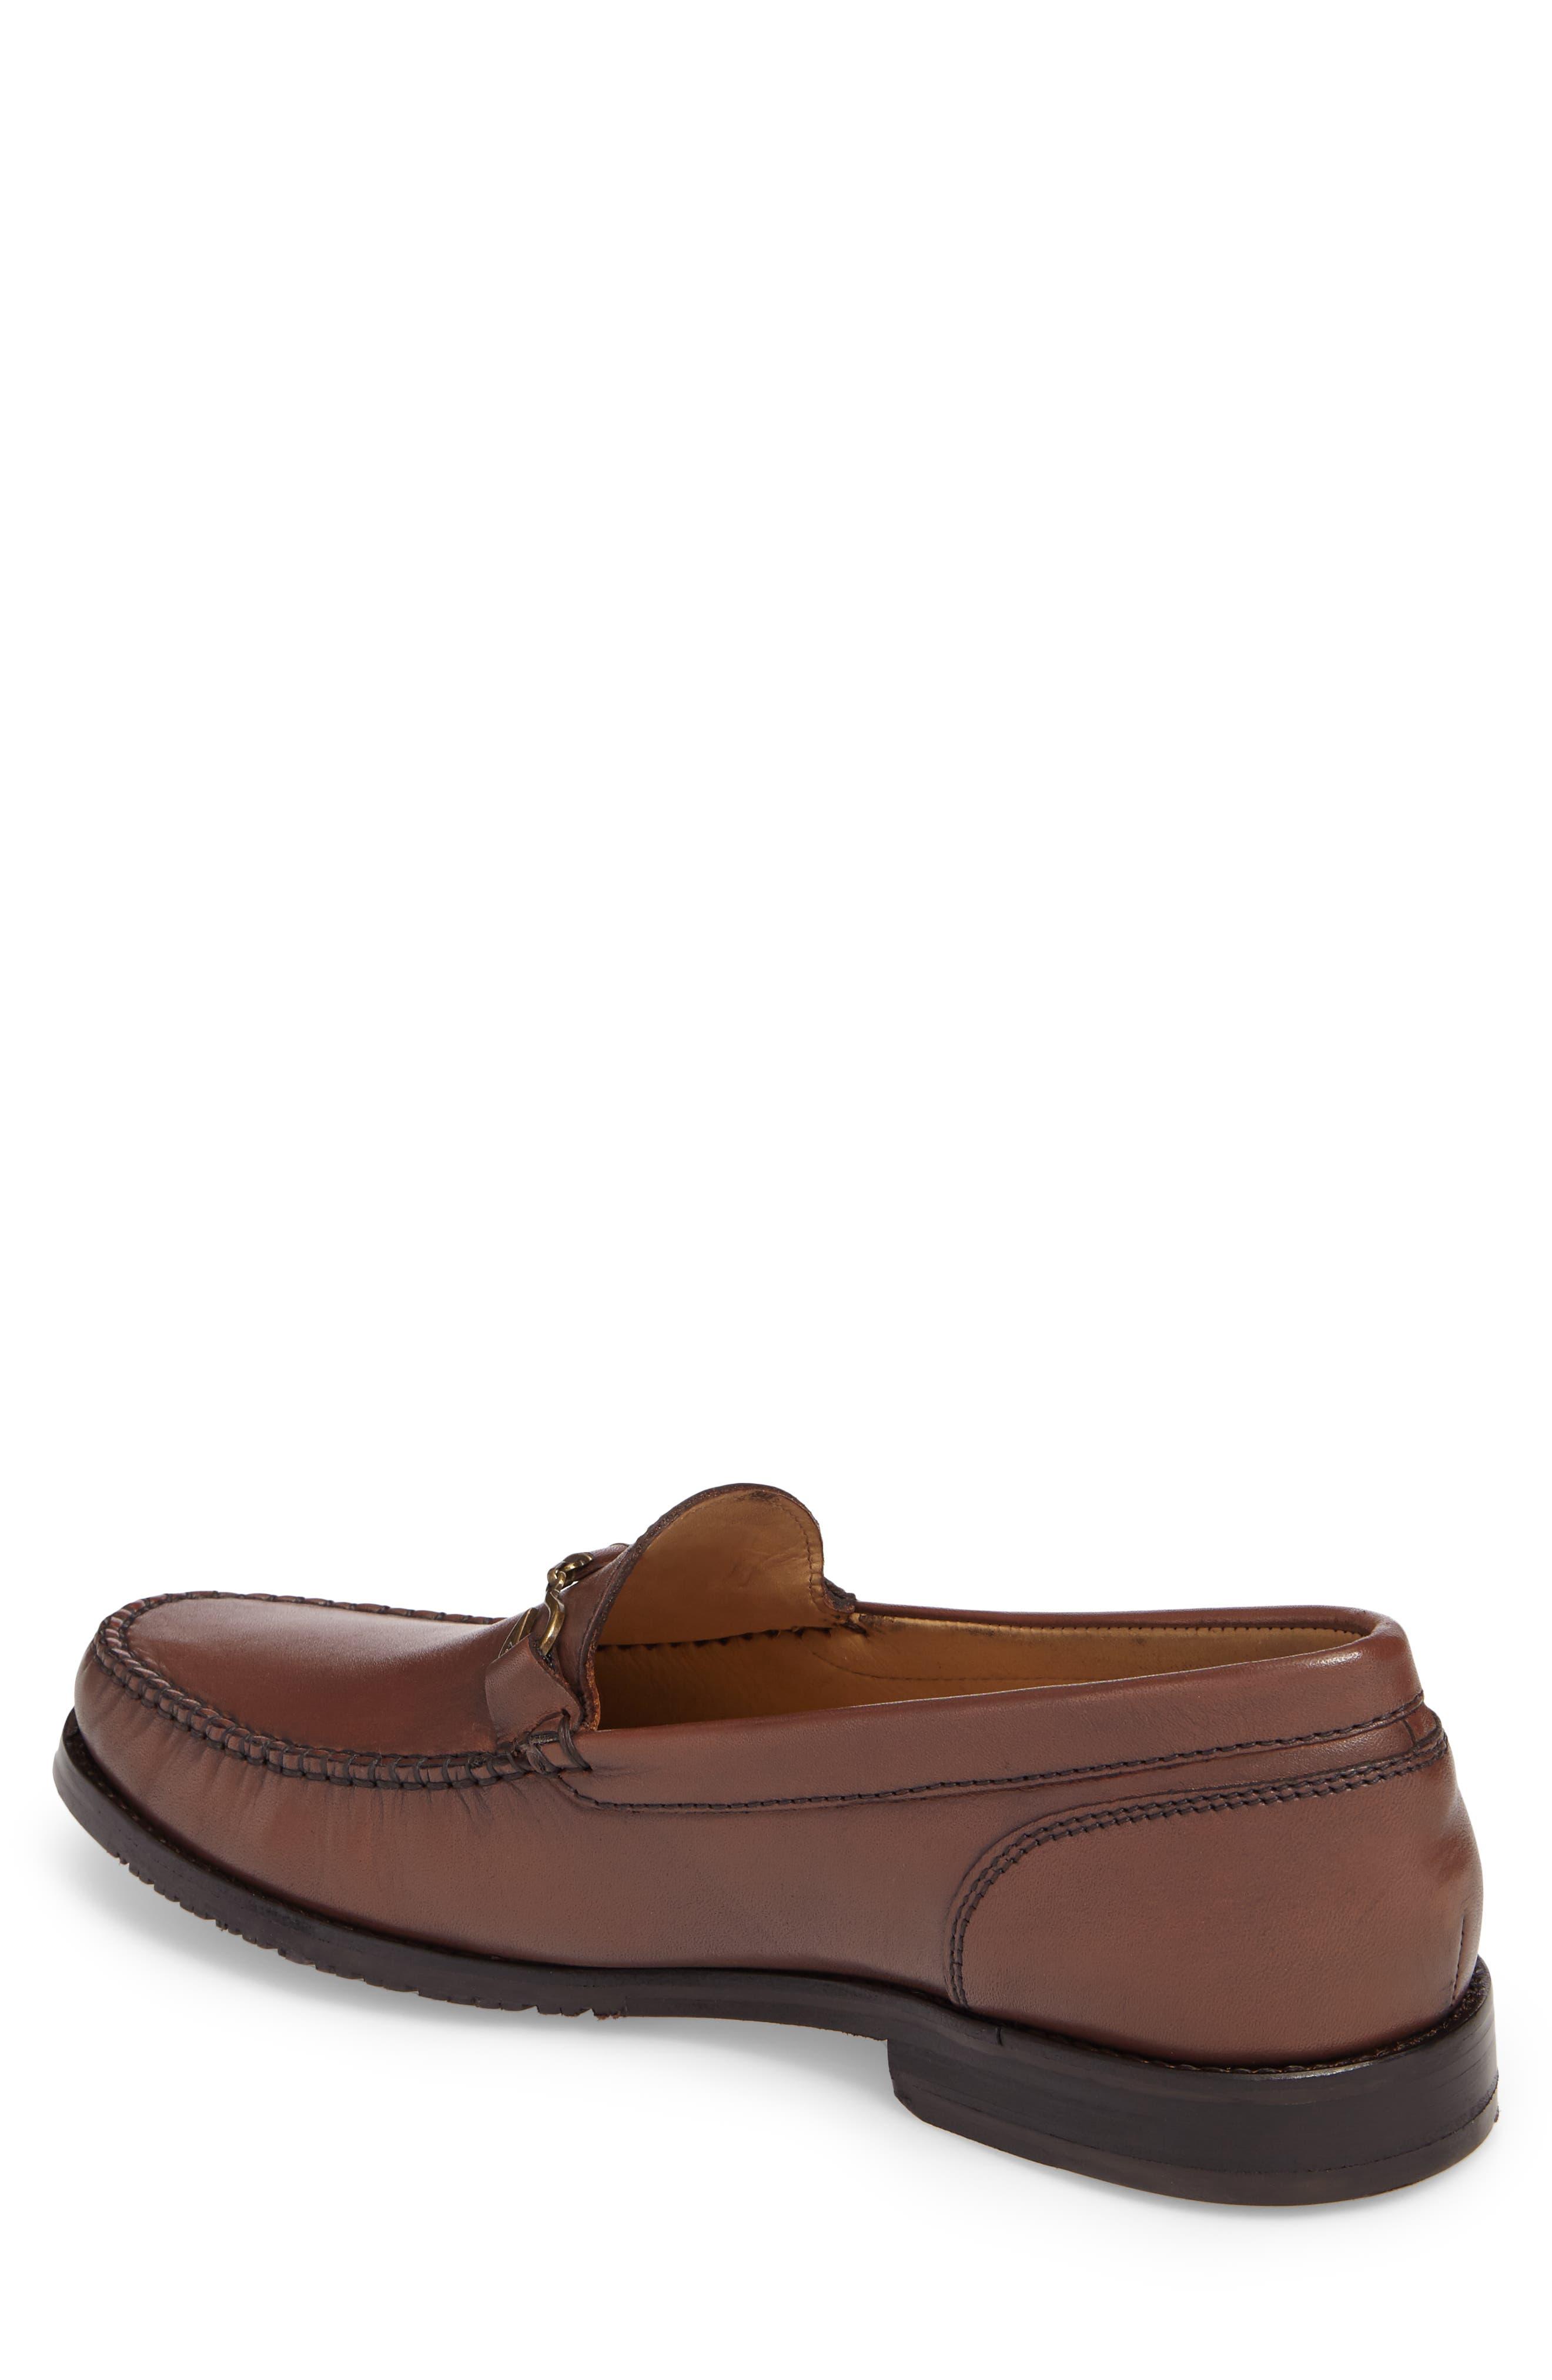 Maya Bay Bit Loafer,                             Alternate thumbnail 2, color,                             Brown Leather